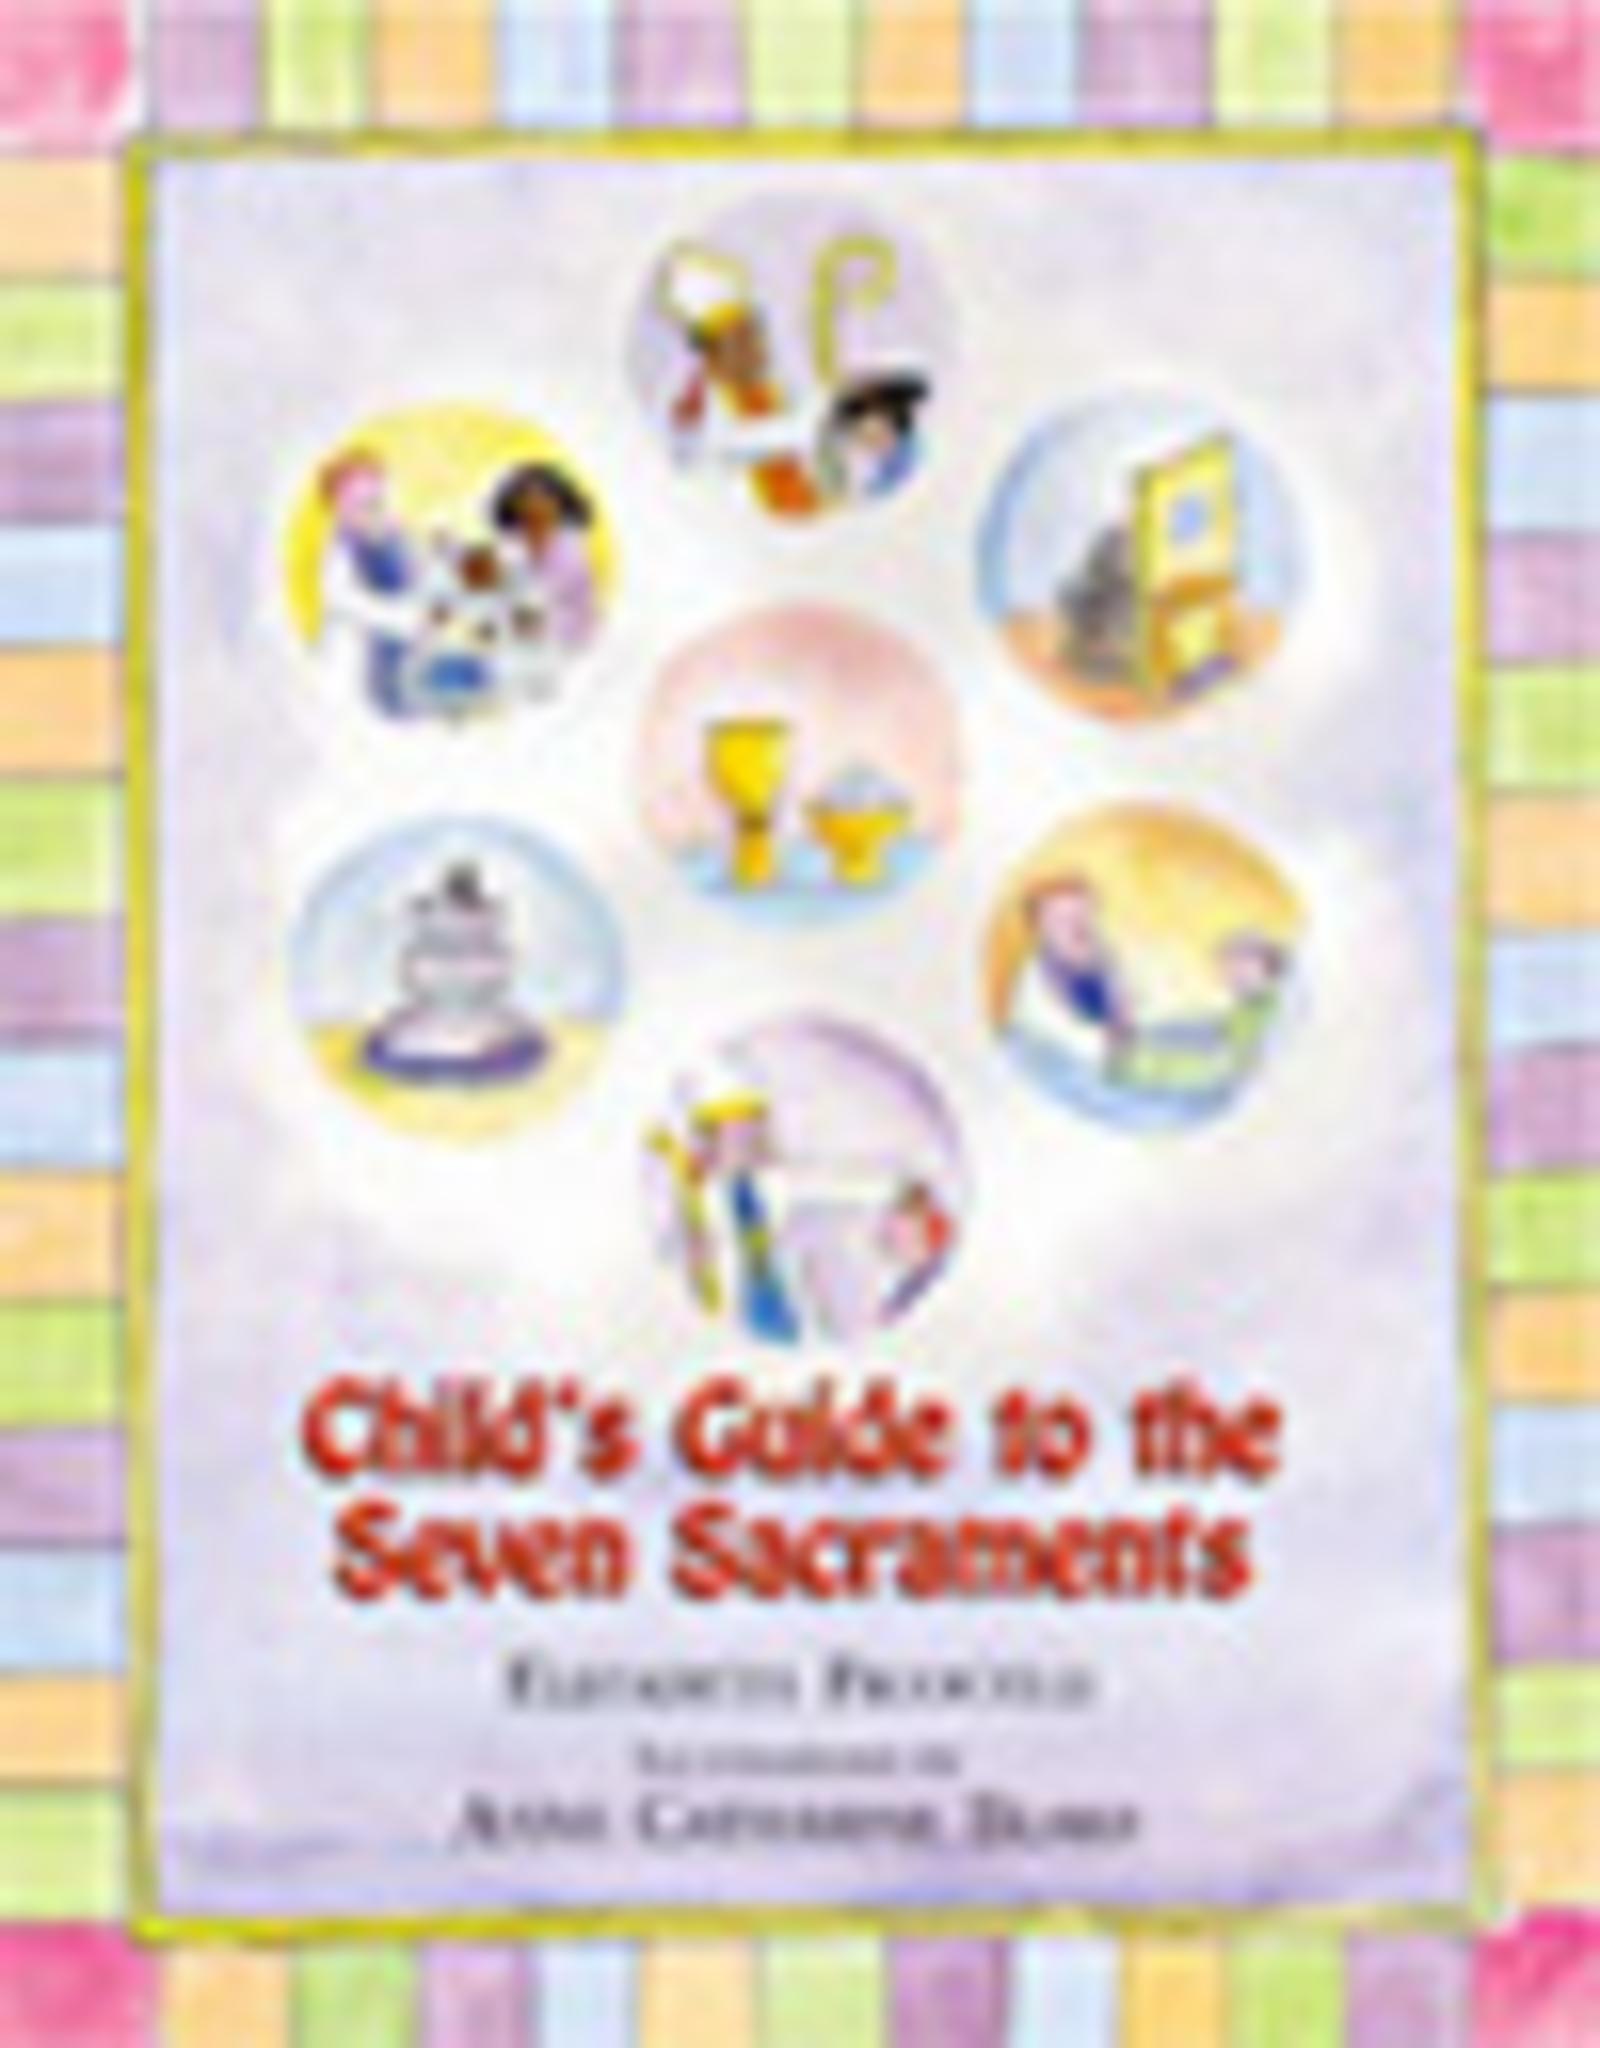 Paulist Press Child's Guide to the Seven Sacraments, by Elizabeth Ficocelli (hardcover)